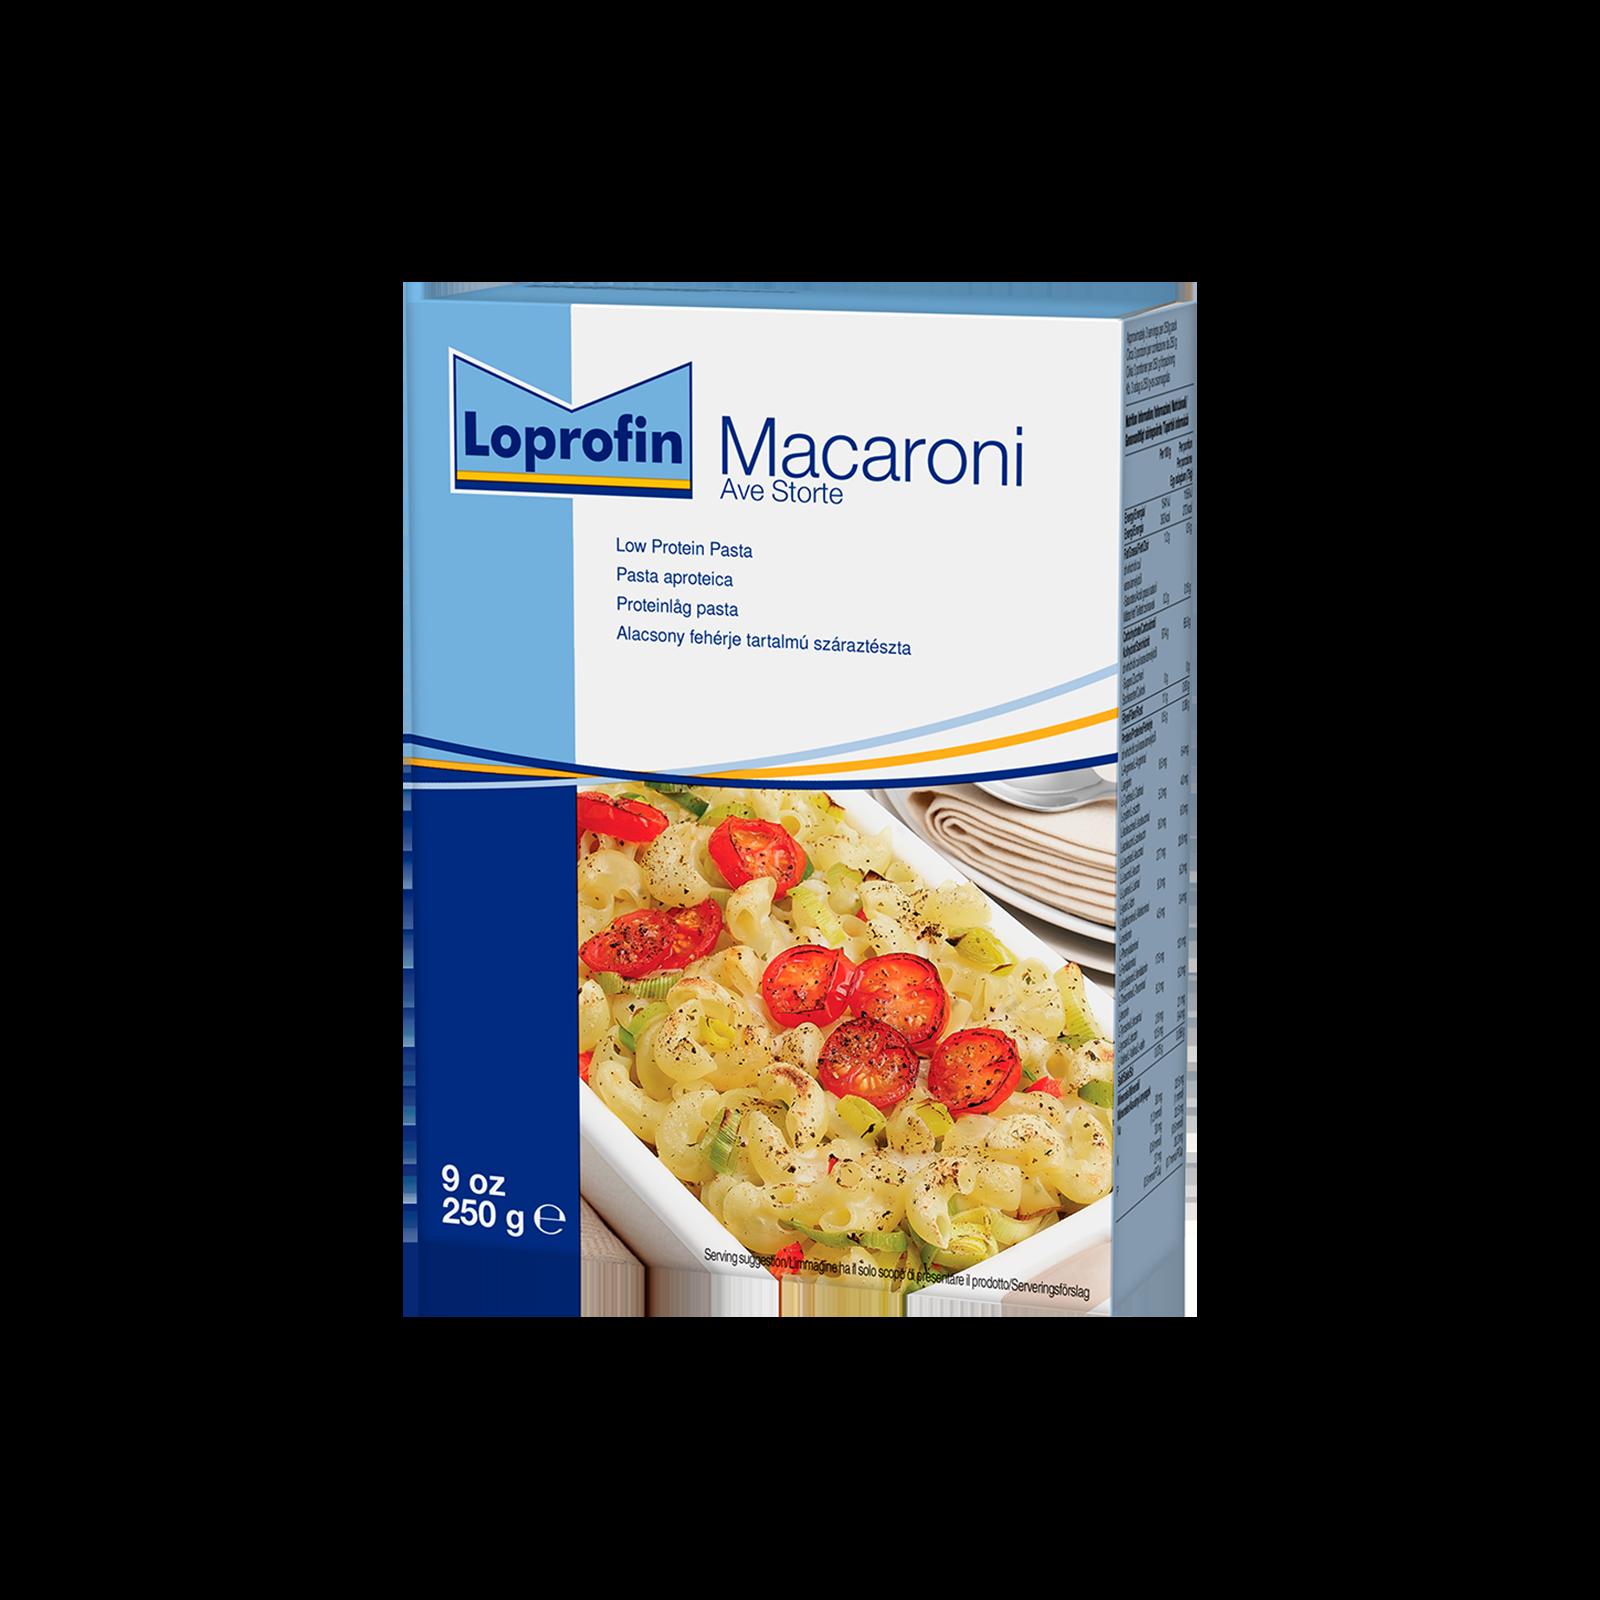 Loprofin Pasta Ave Storte scatola da 250g   Nutricia